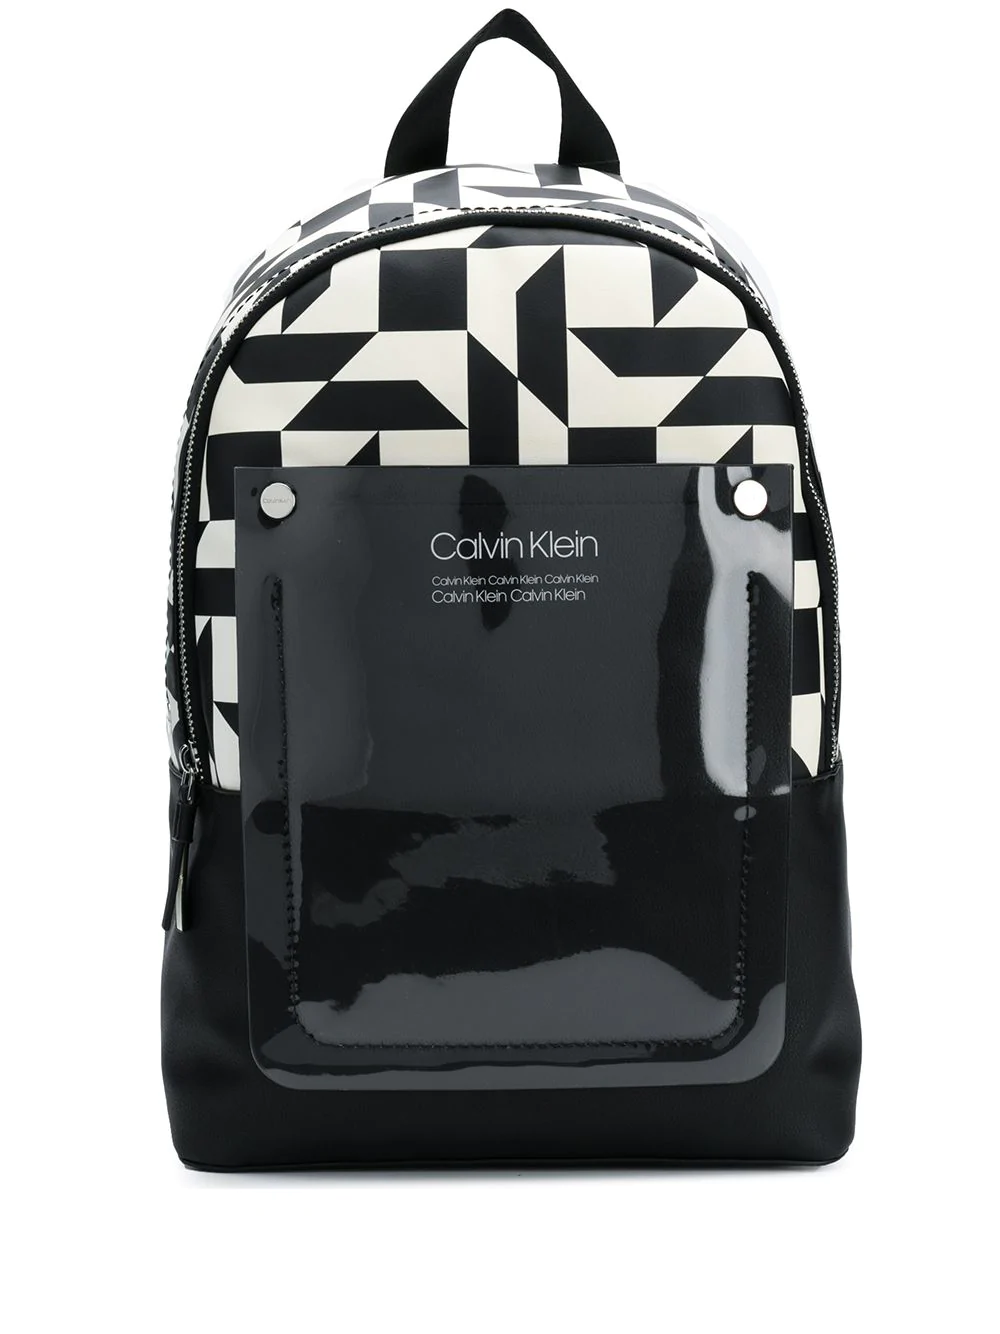 Calvin Klein Geometric Pattern Backpack - Black  d63c06e594913